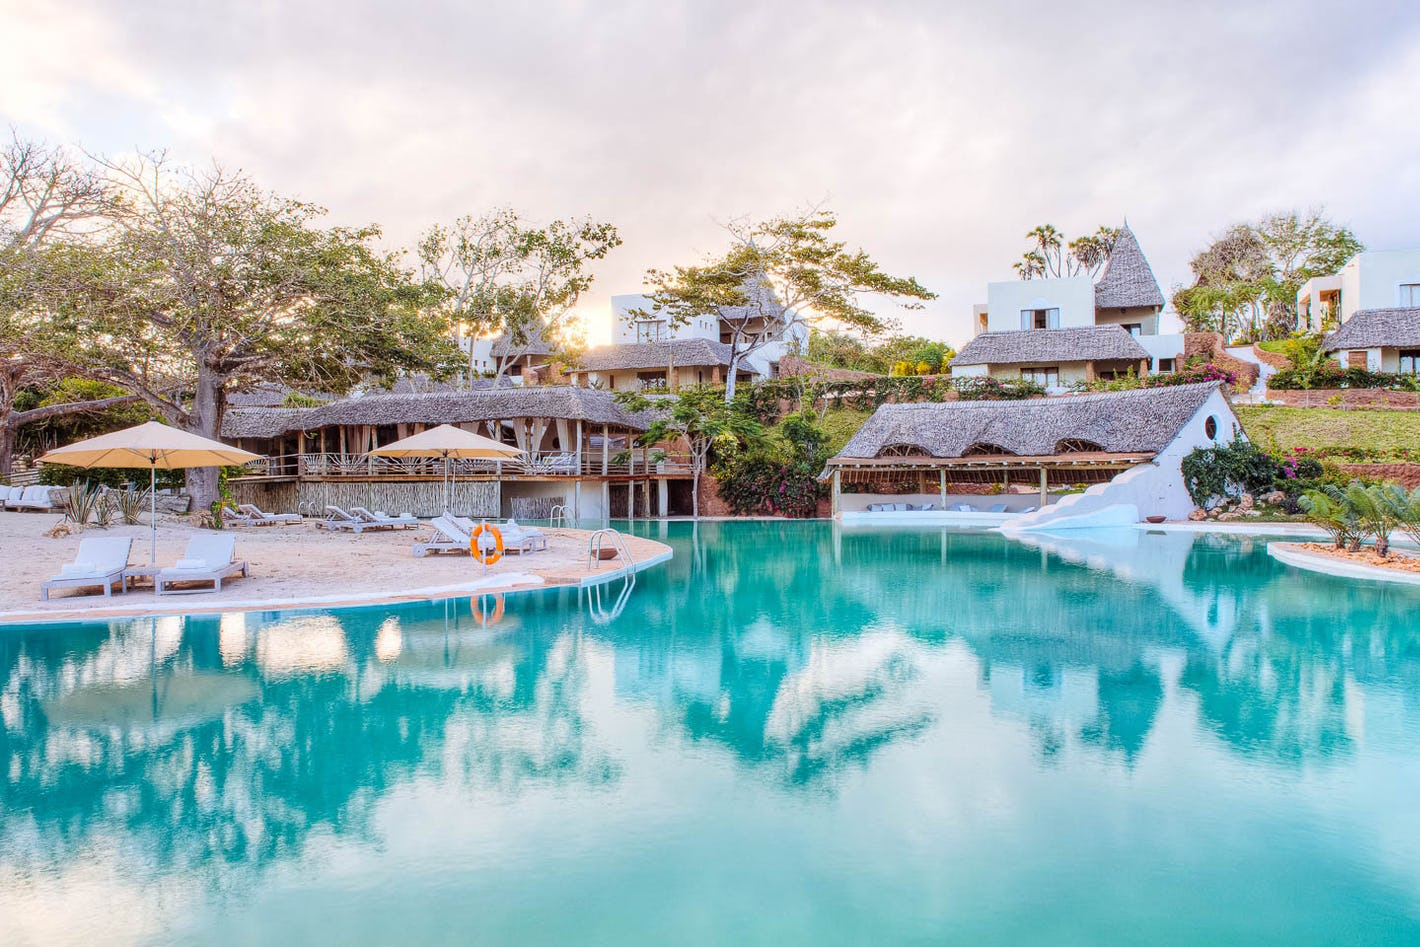 Design your msambweni beach holiday online timbuktu travel for Pool designs under 50 000